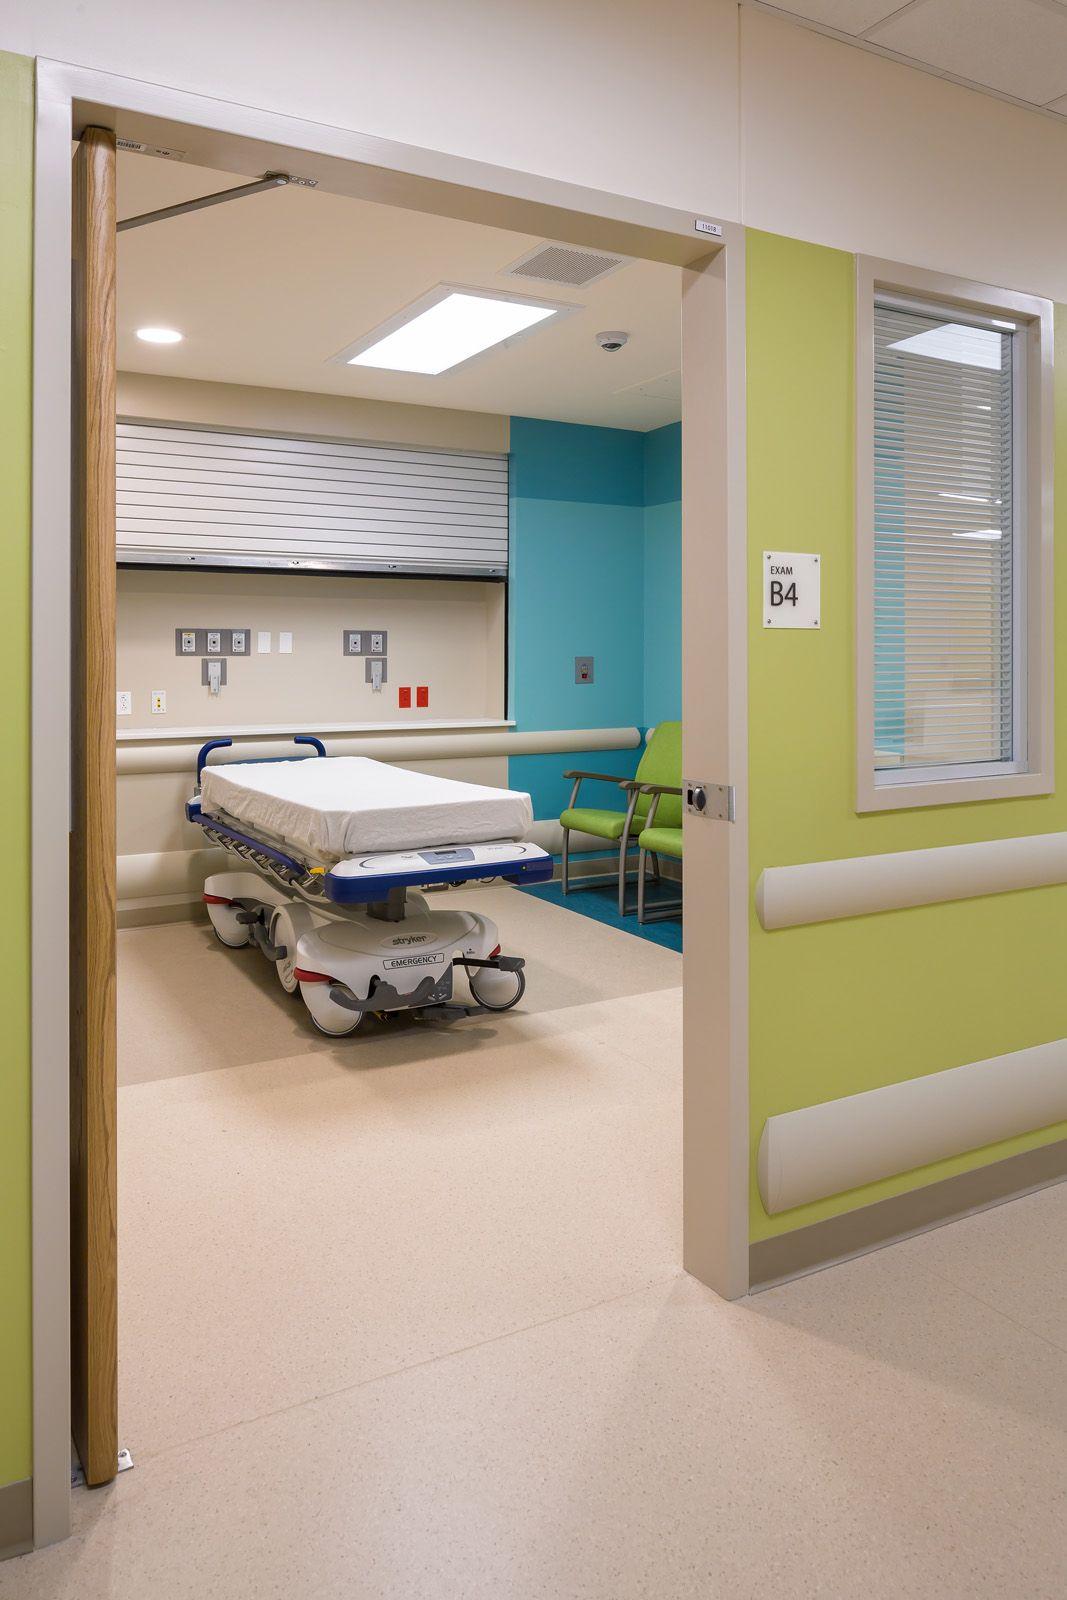 Behavioralhealth Ed Room Akron Children S Hospital Hasenstab Architects Hospital Interior Design Hospital Design Healthcare Design